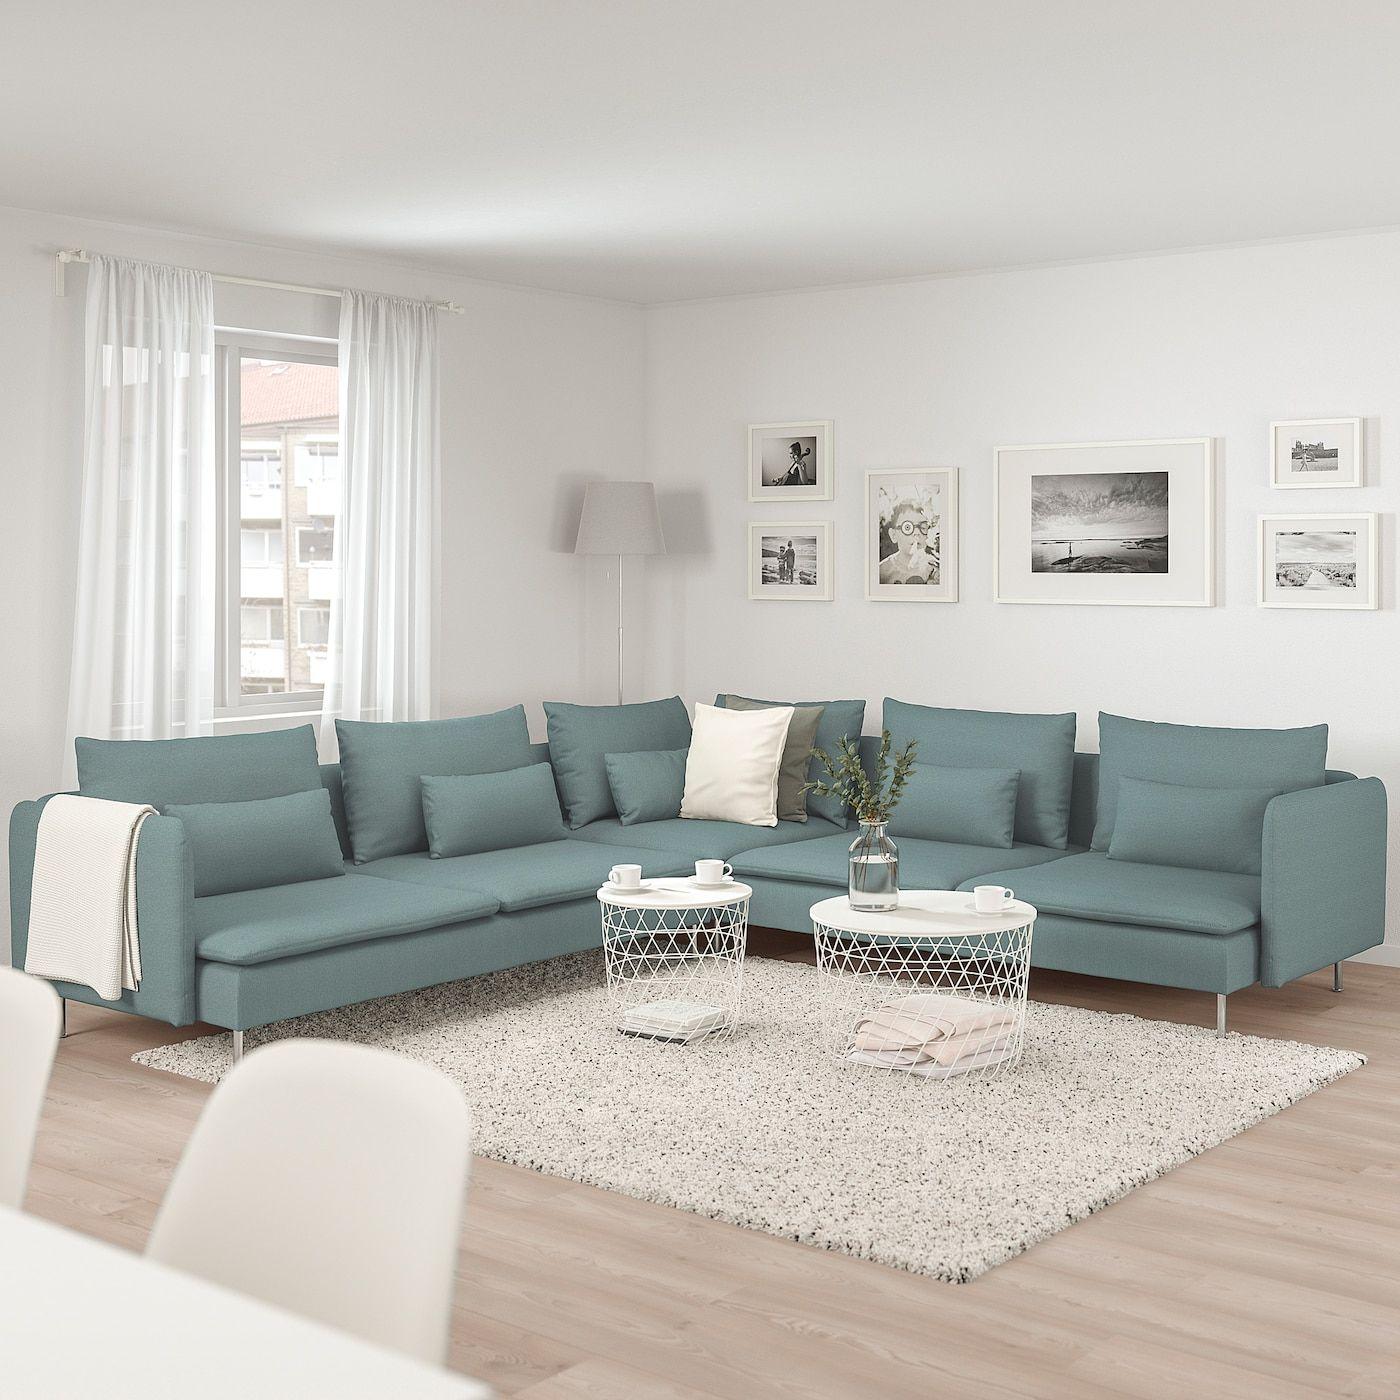 ikea  sÖderhamn sectional 5seat in 2020  living room